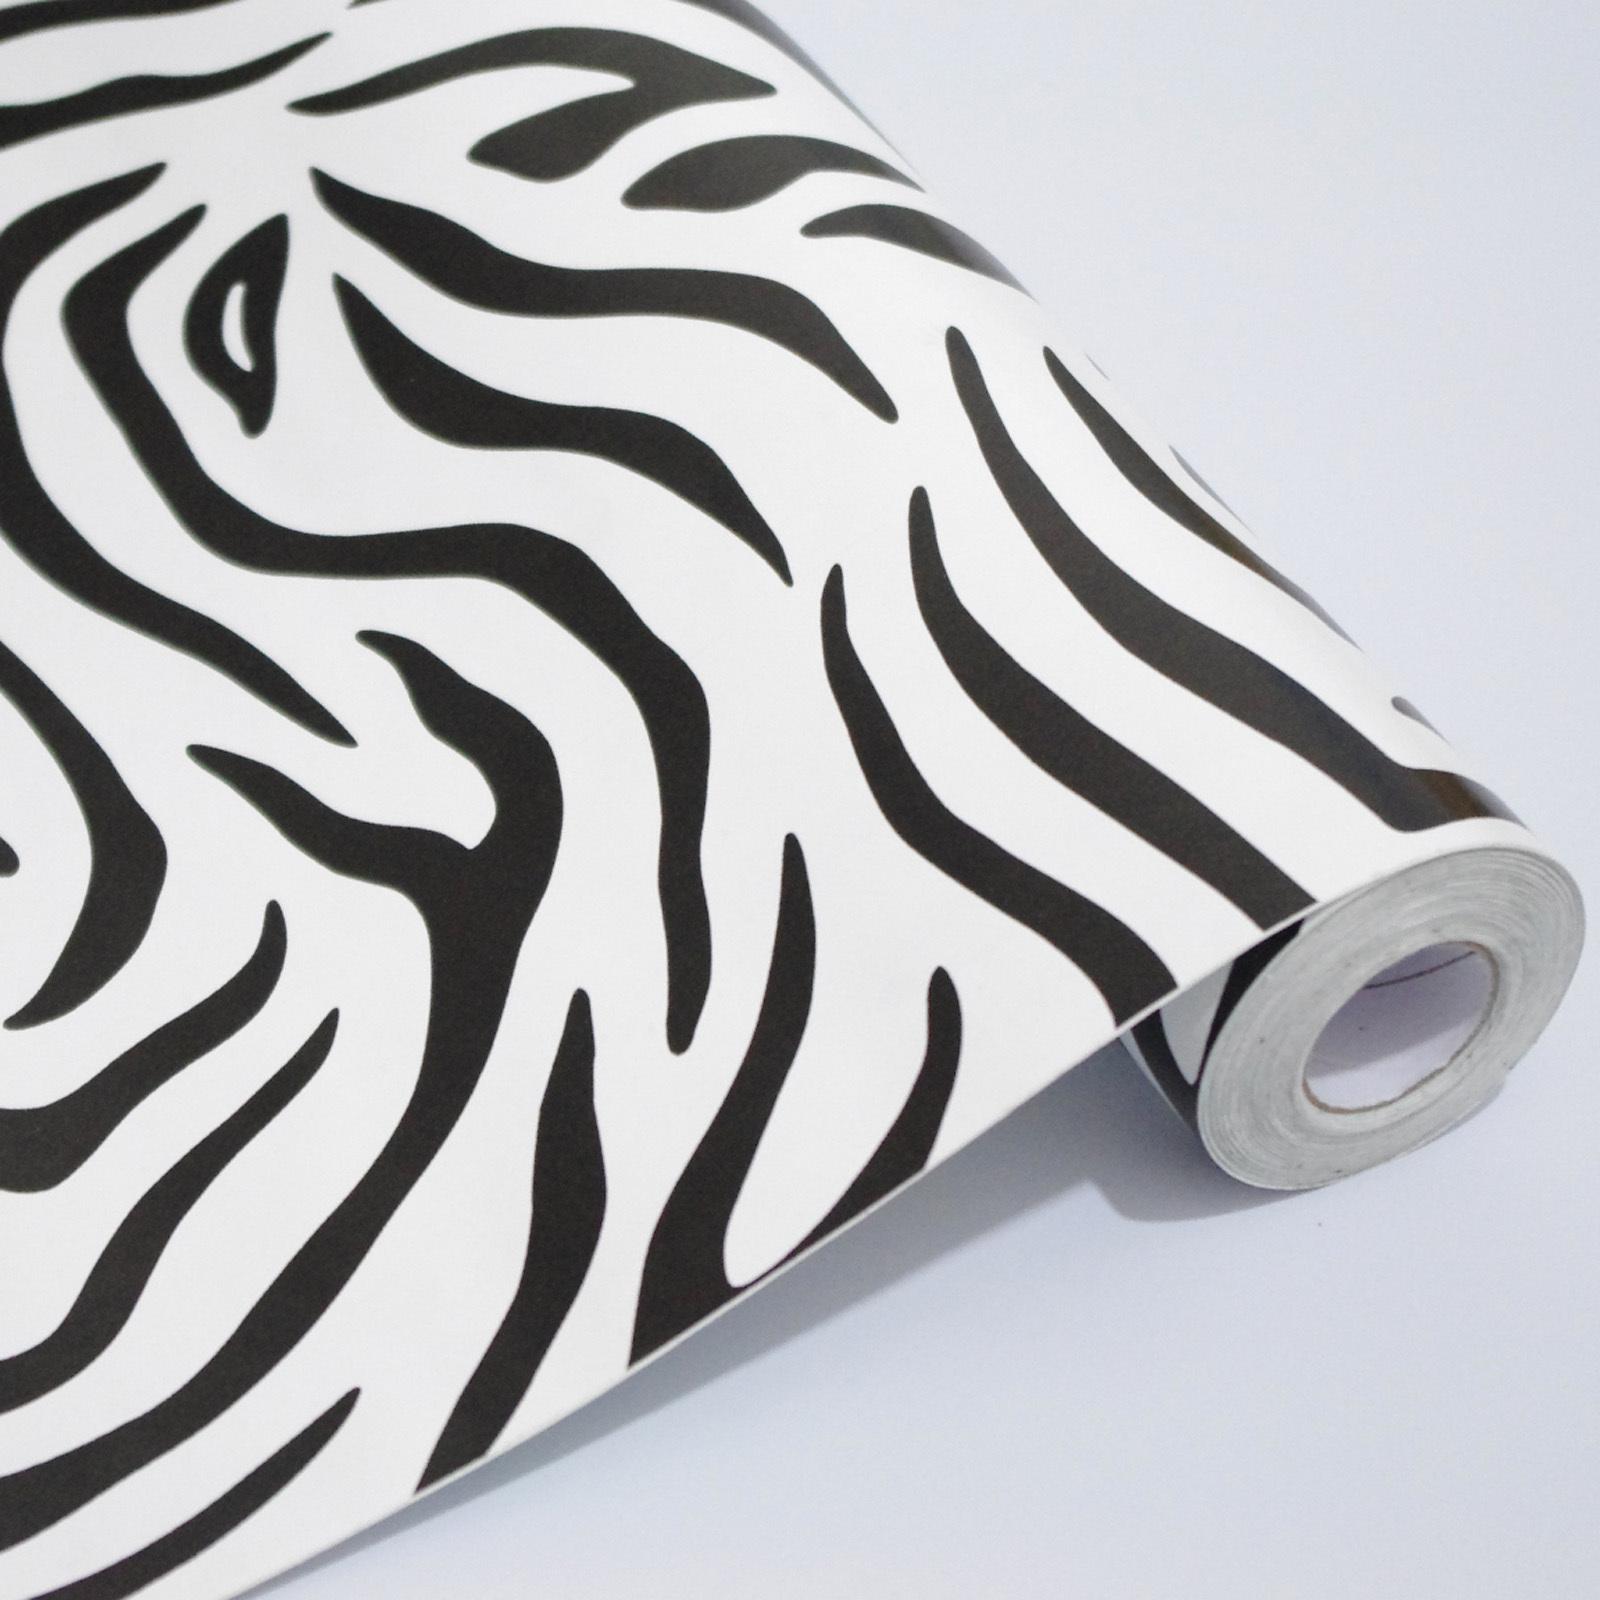 popular zebra print furniture from china best selling